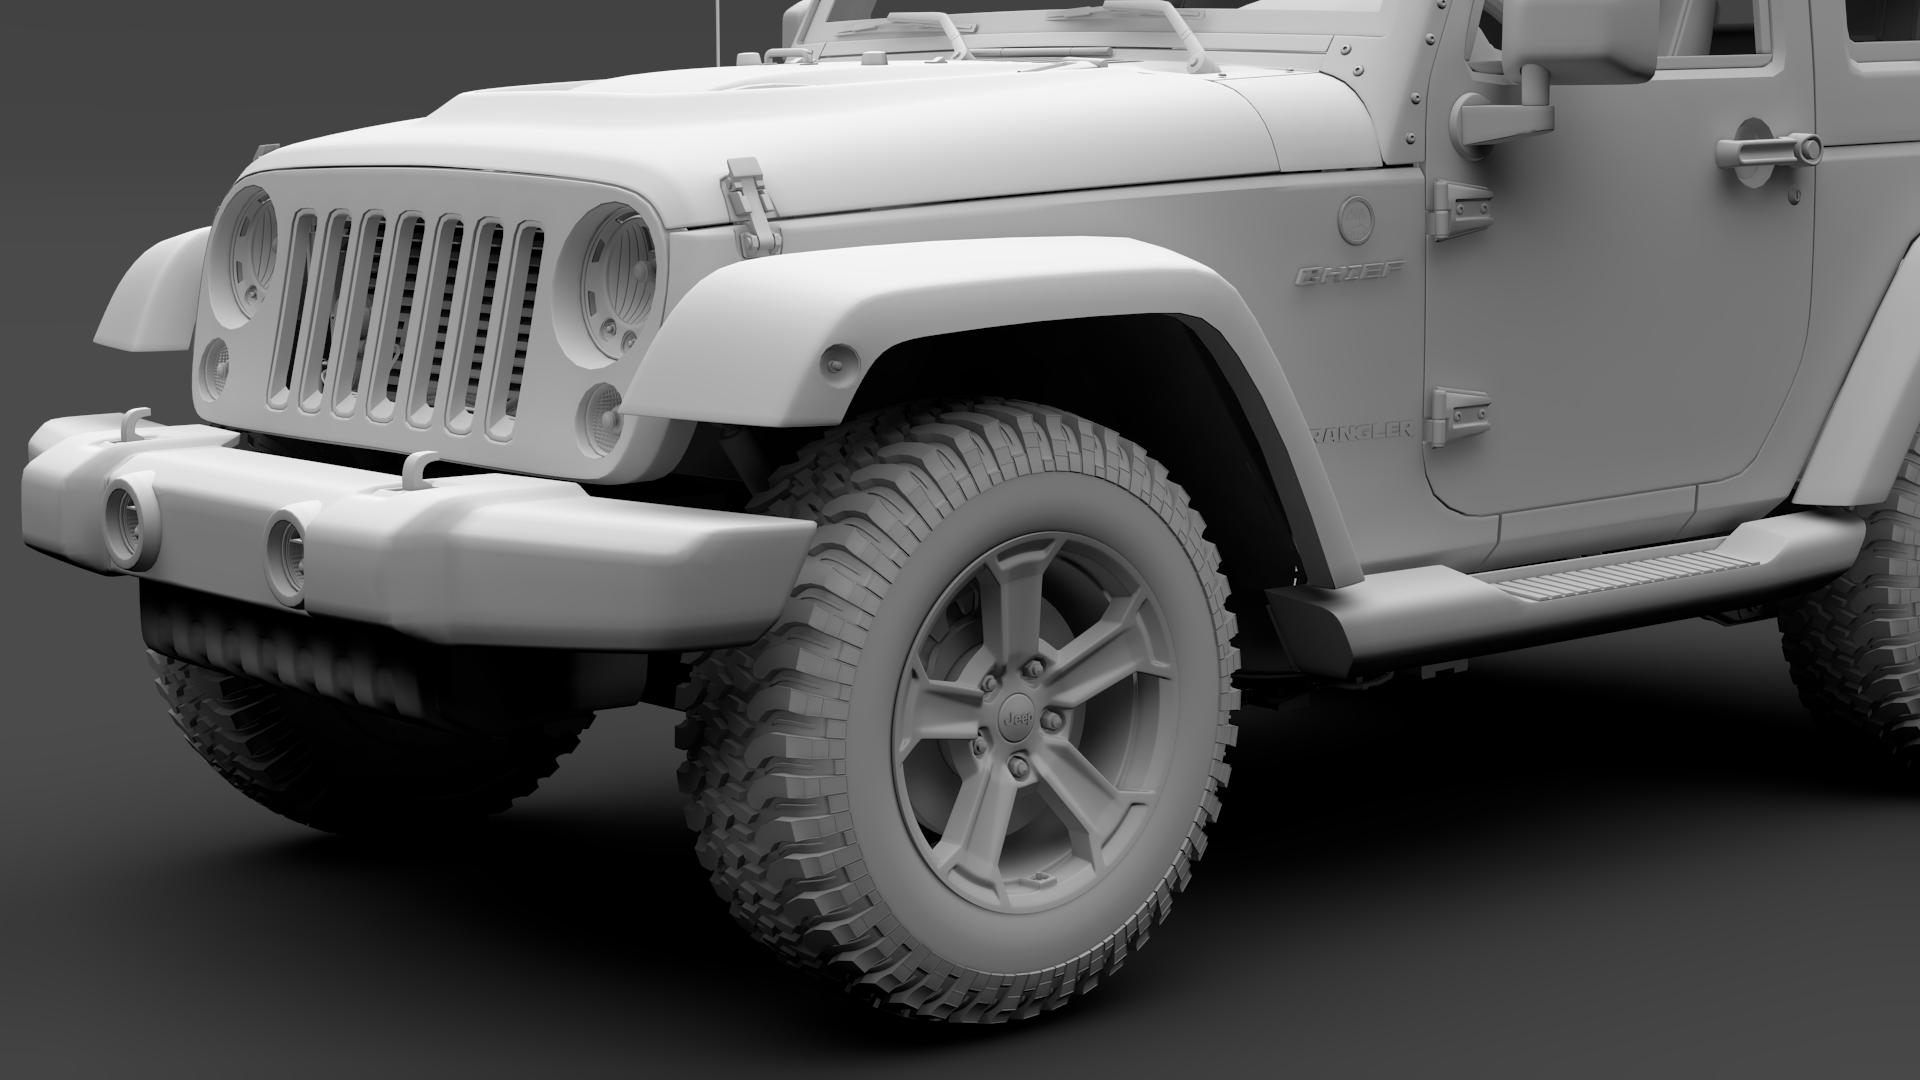 jeep wrangler chief jk 2017 3d model max fbx c4d lwo ma mb hrc xsi obj 276891